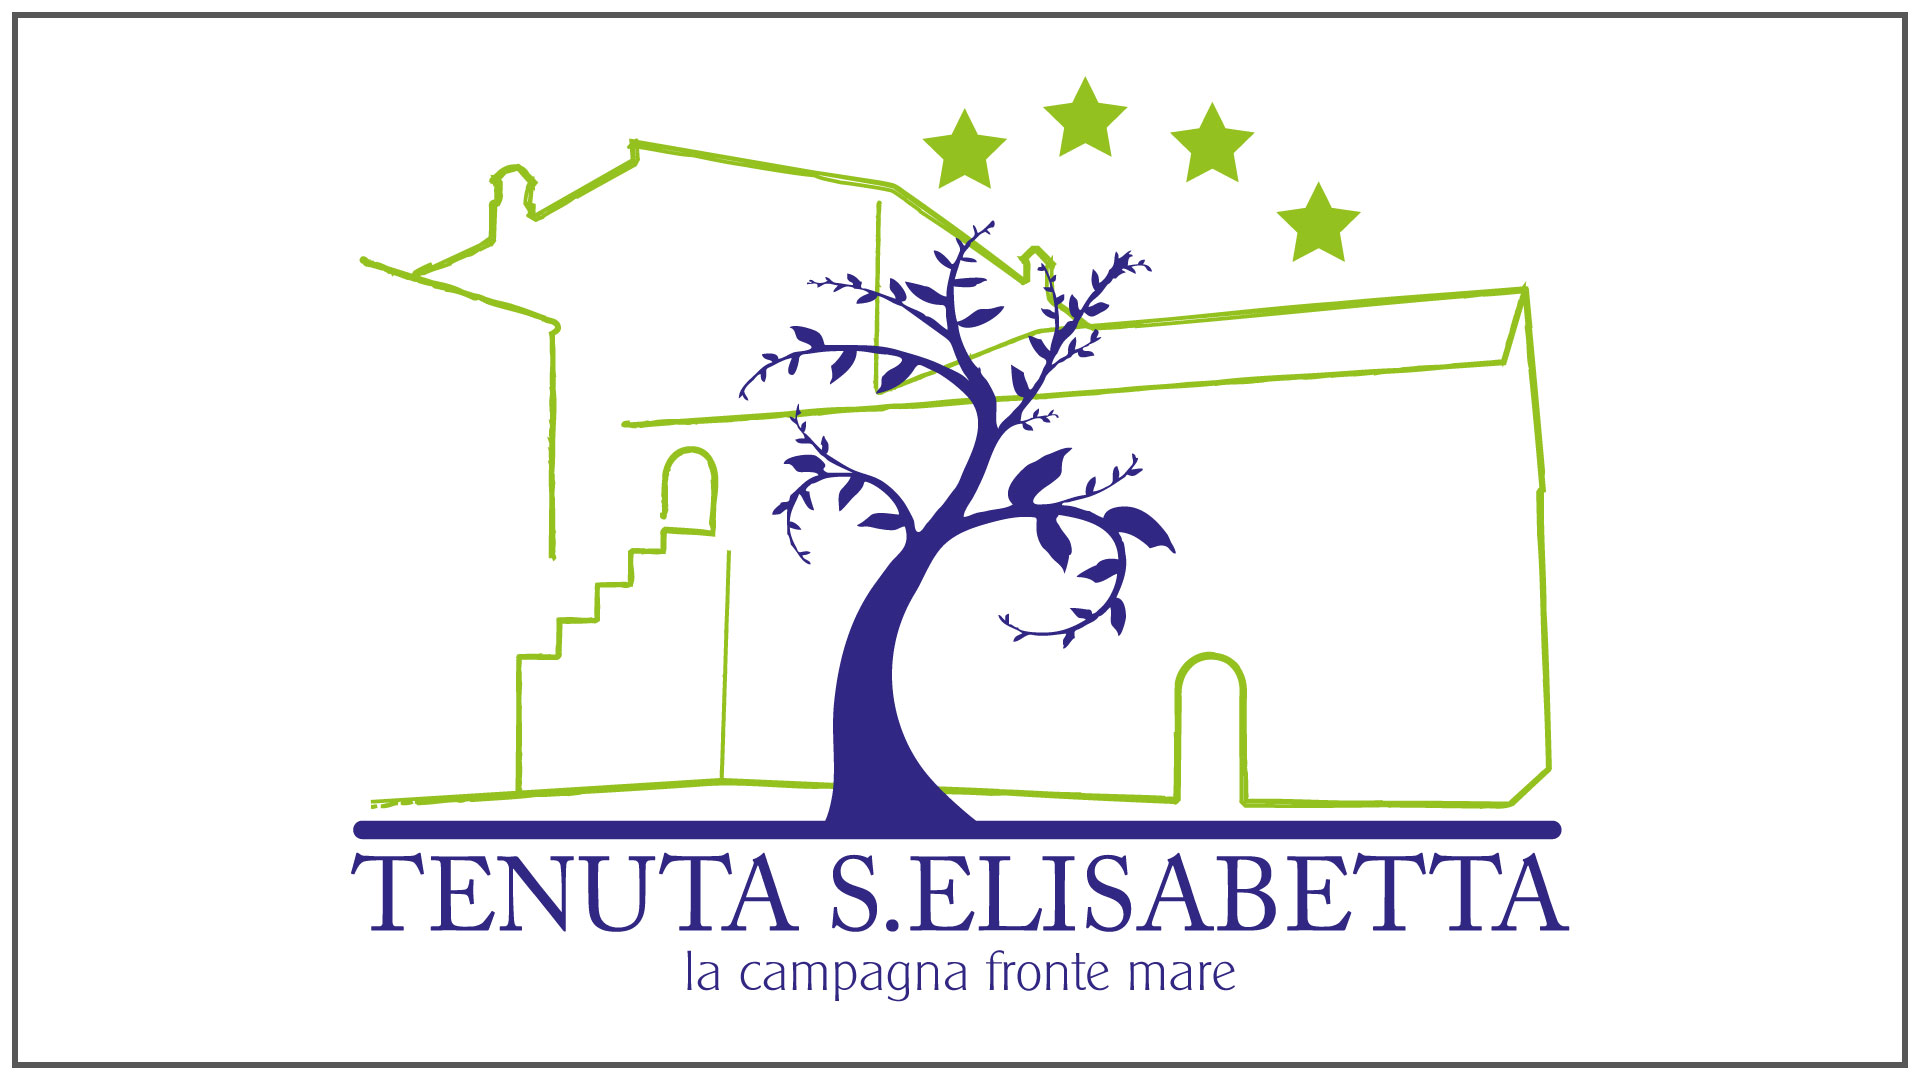 promediart_portfolio_logo-design_TENUTA-S-ELISABETTA